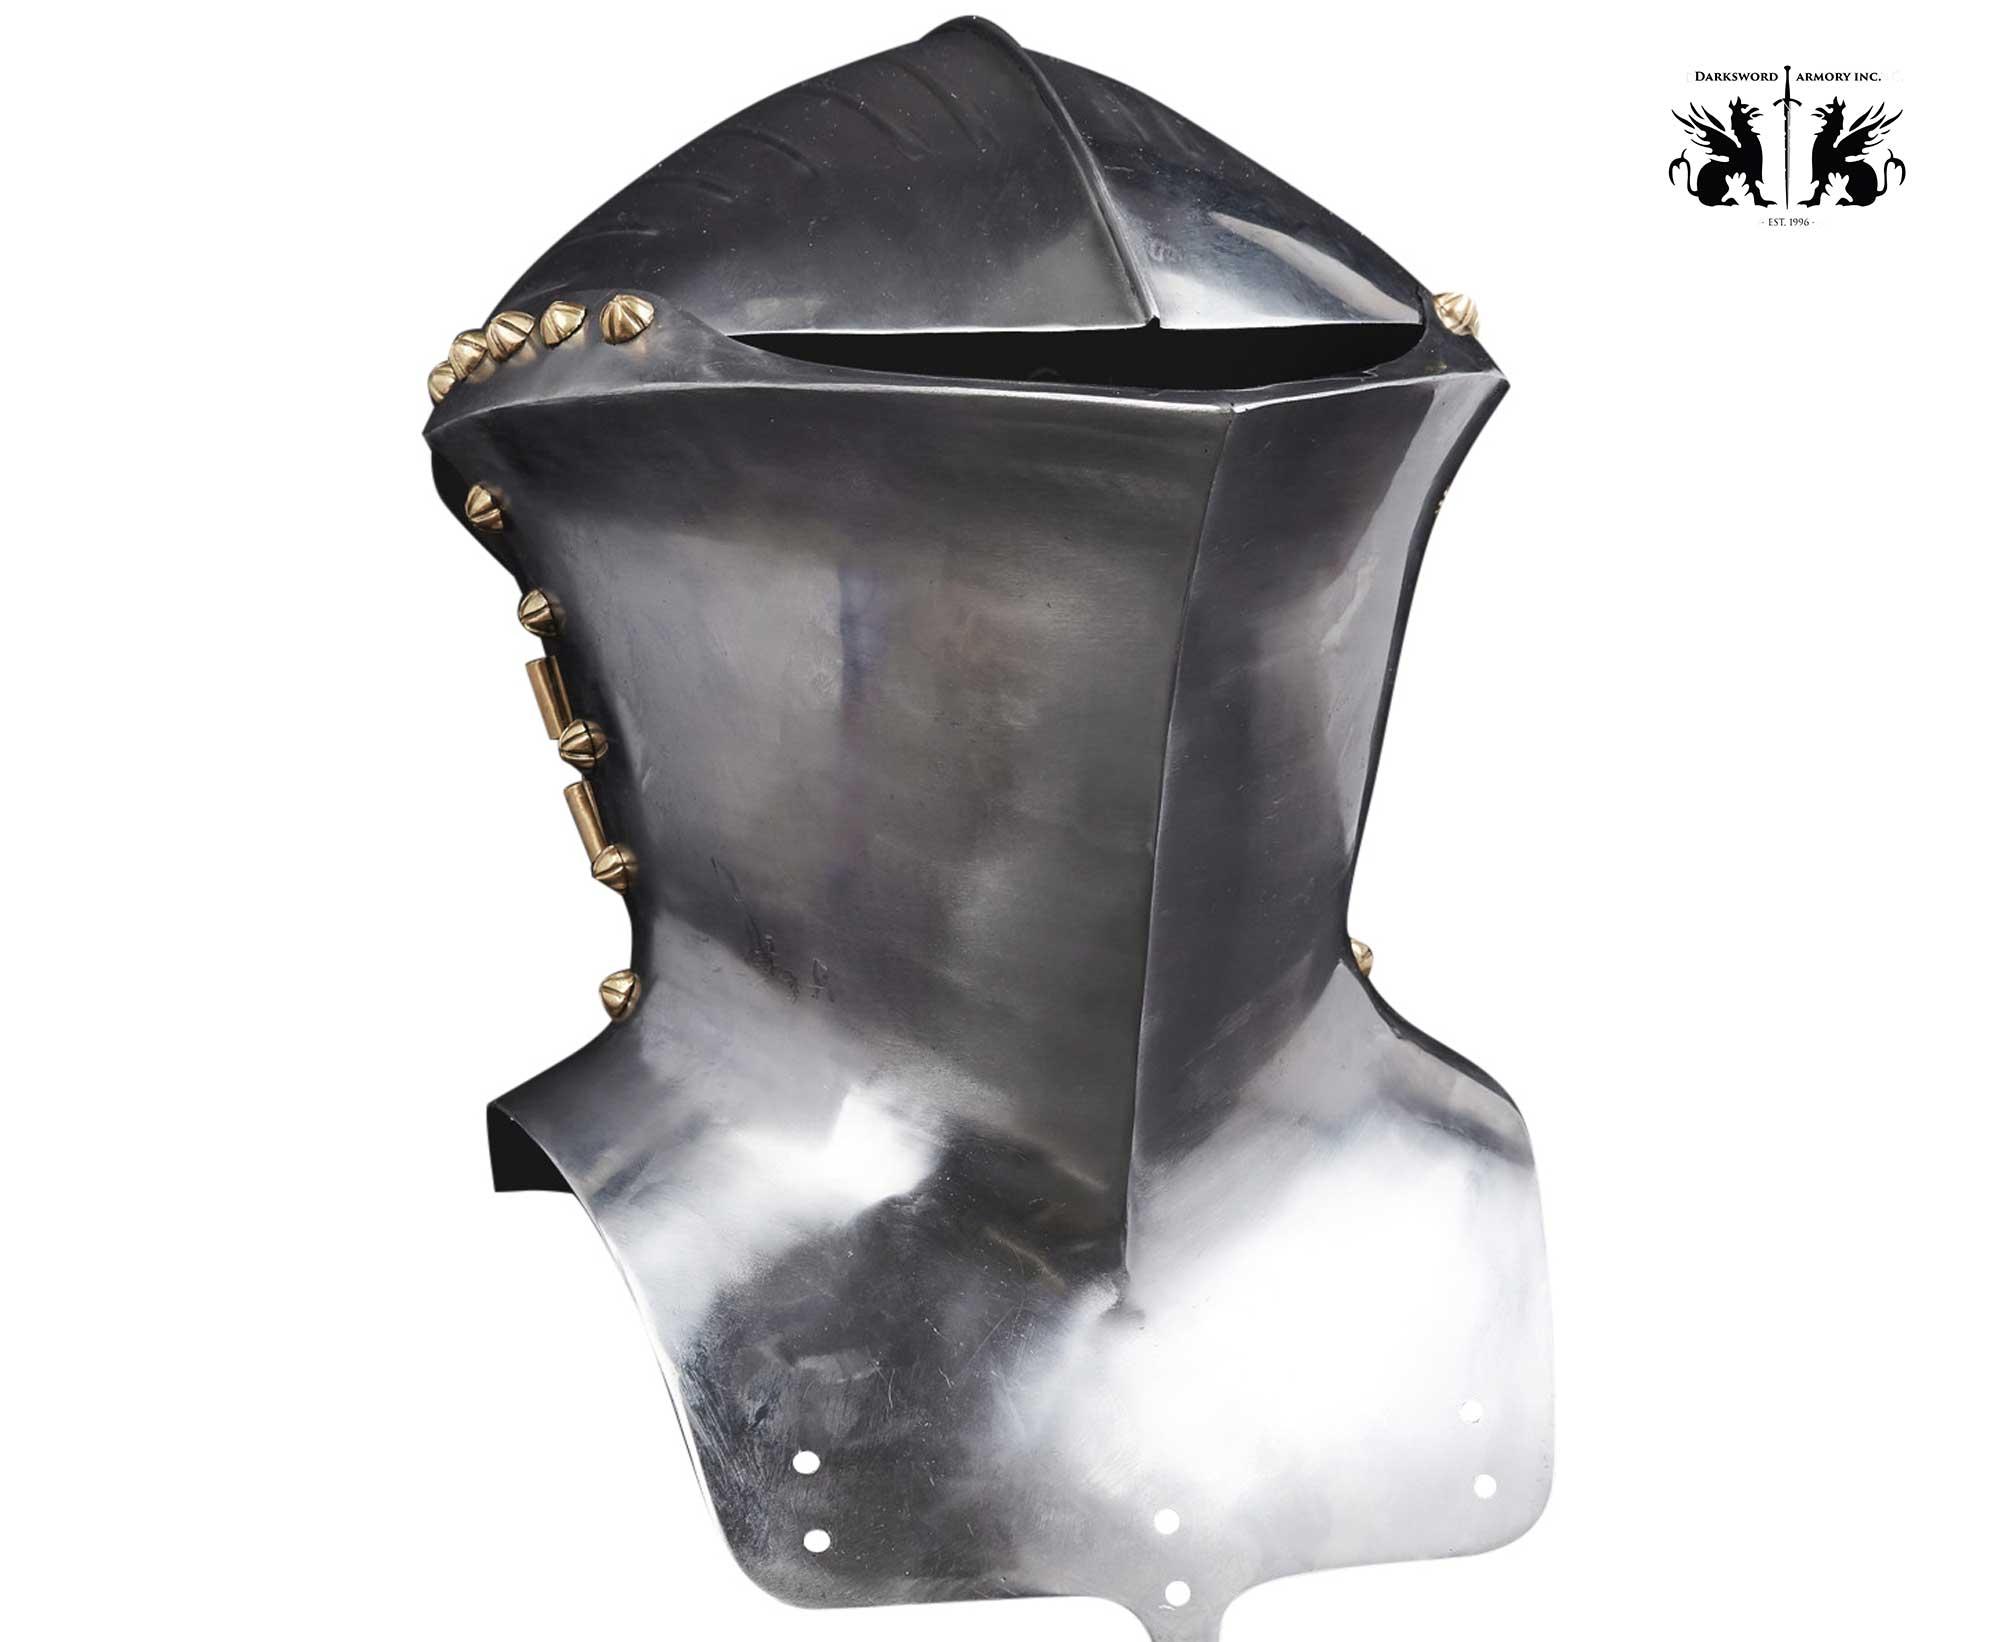 jousting-helm-stechhelm-medieval-armor-helmet-1731-3